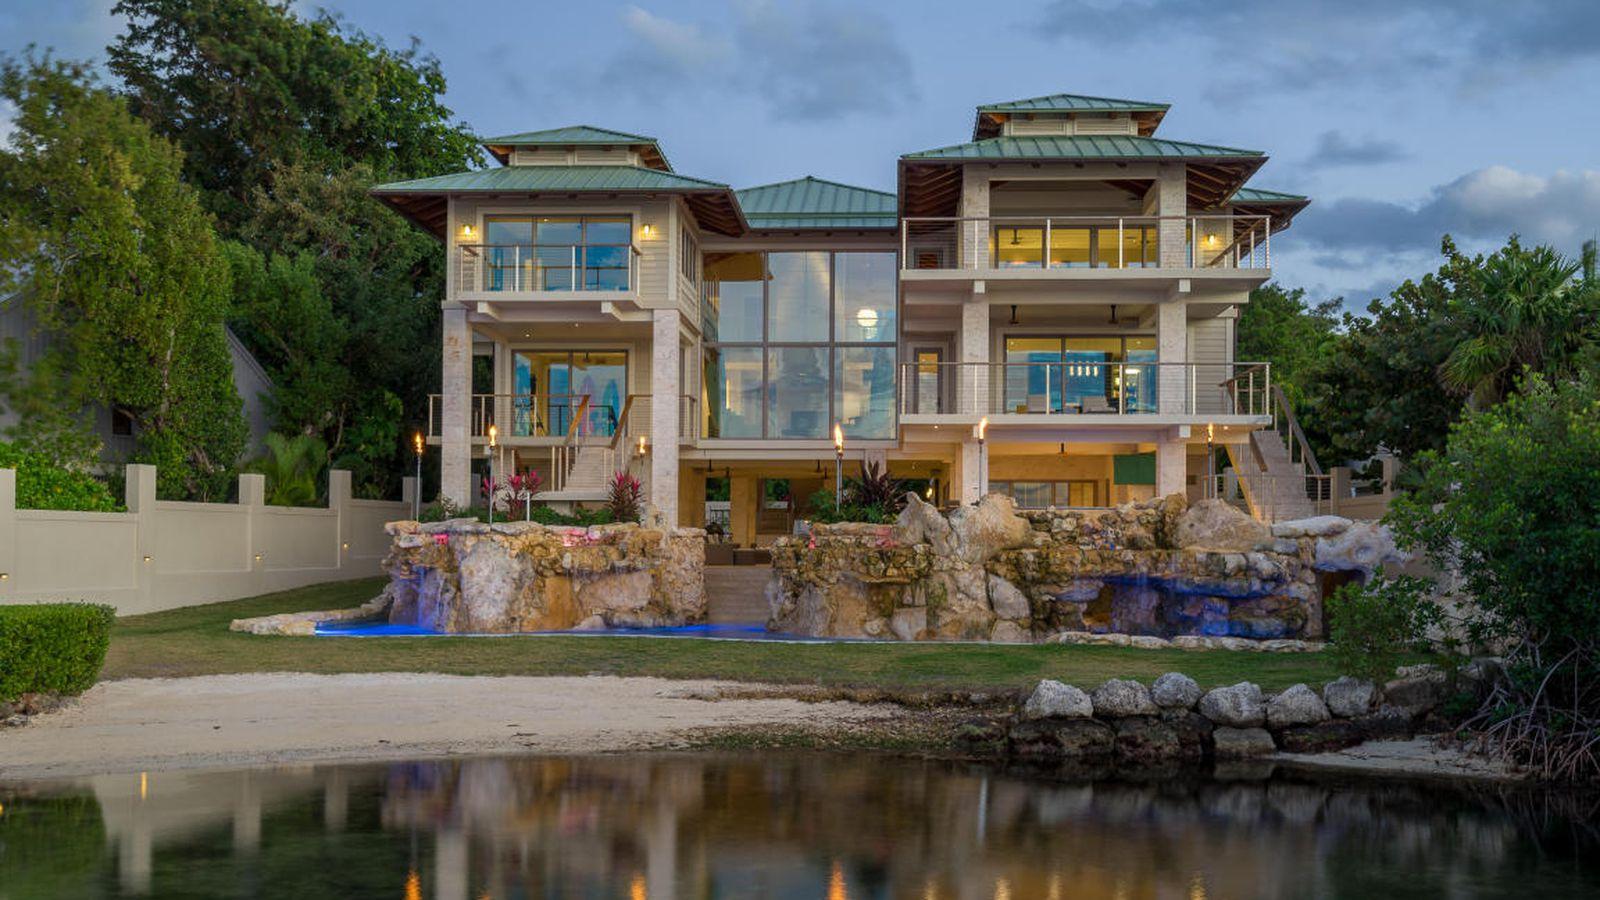 Florida Keys Dream Mansion With Sensational Grotto Asks